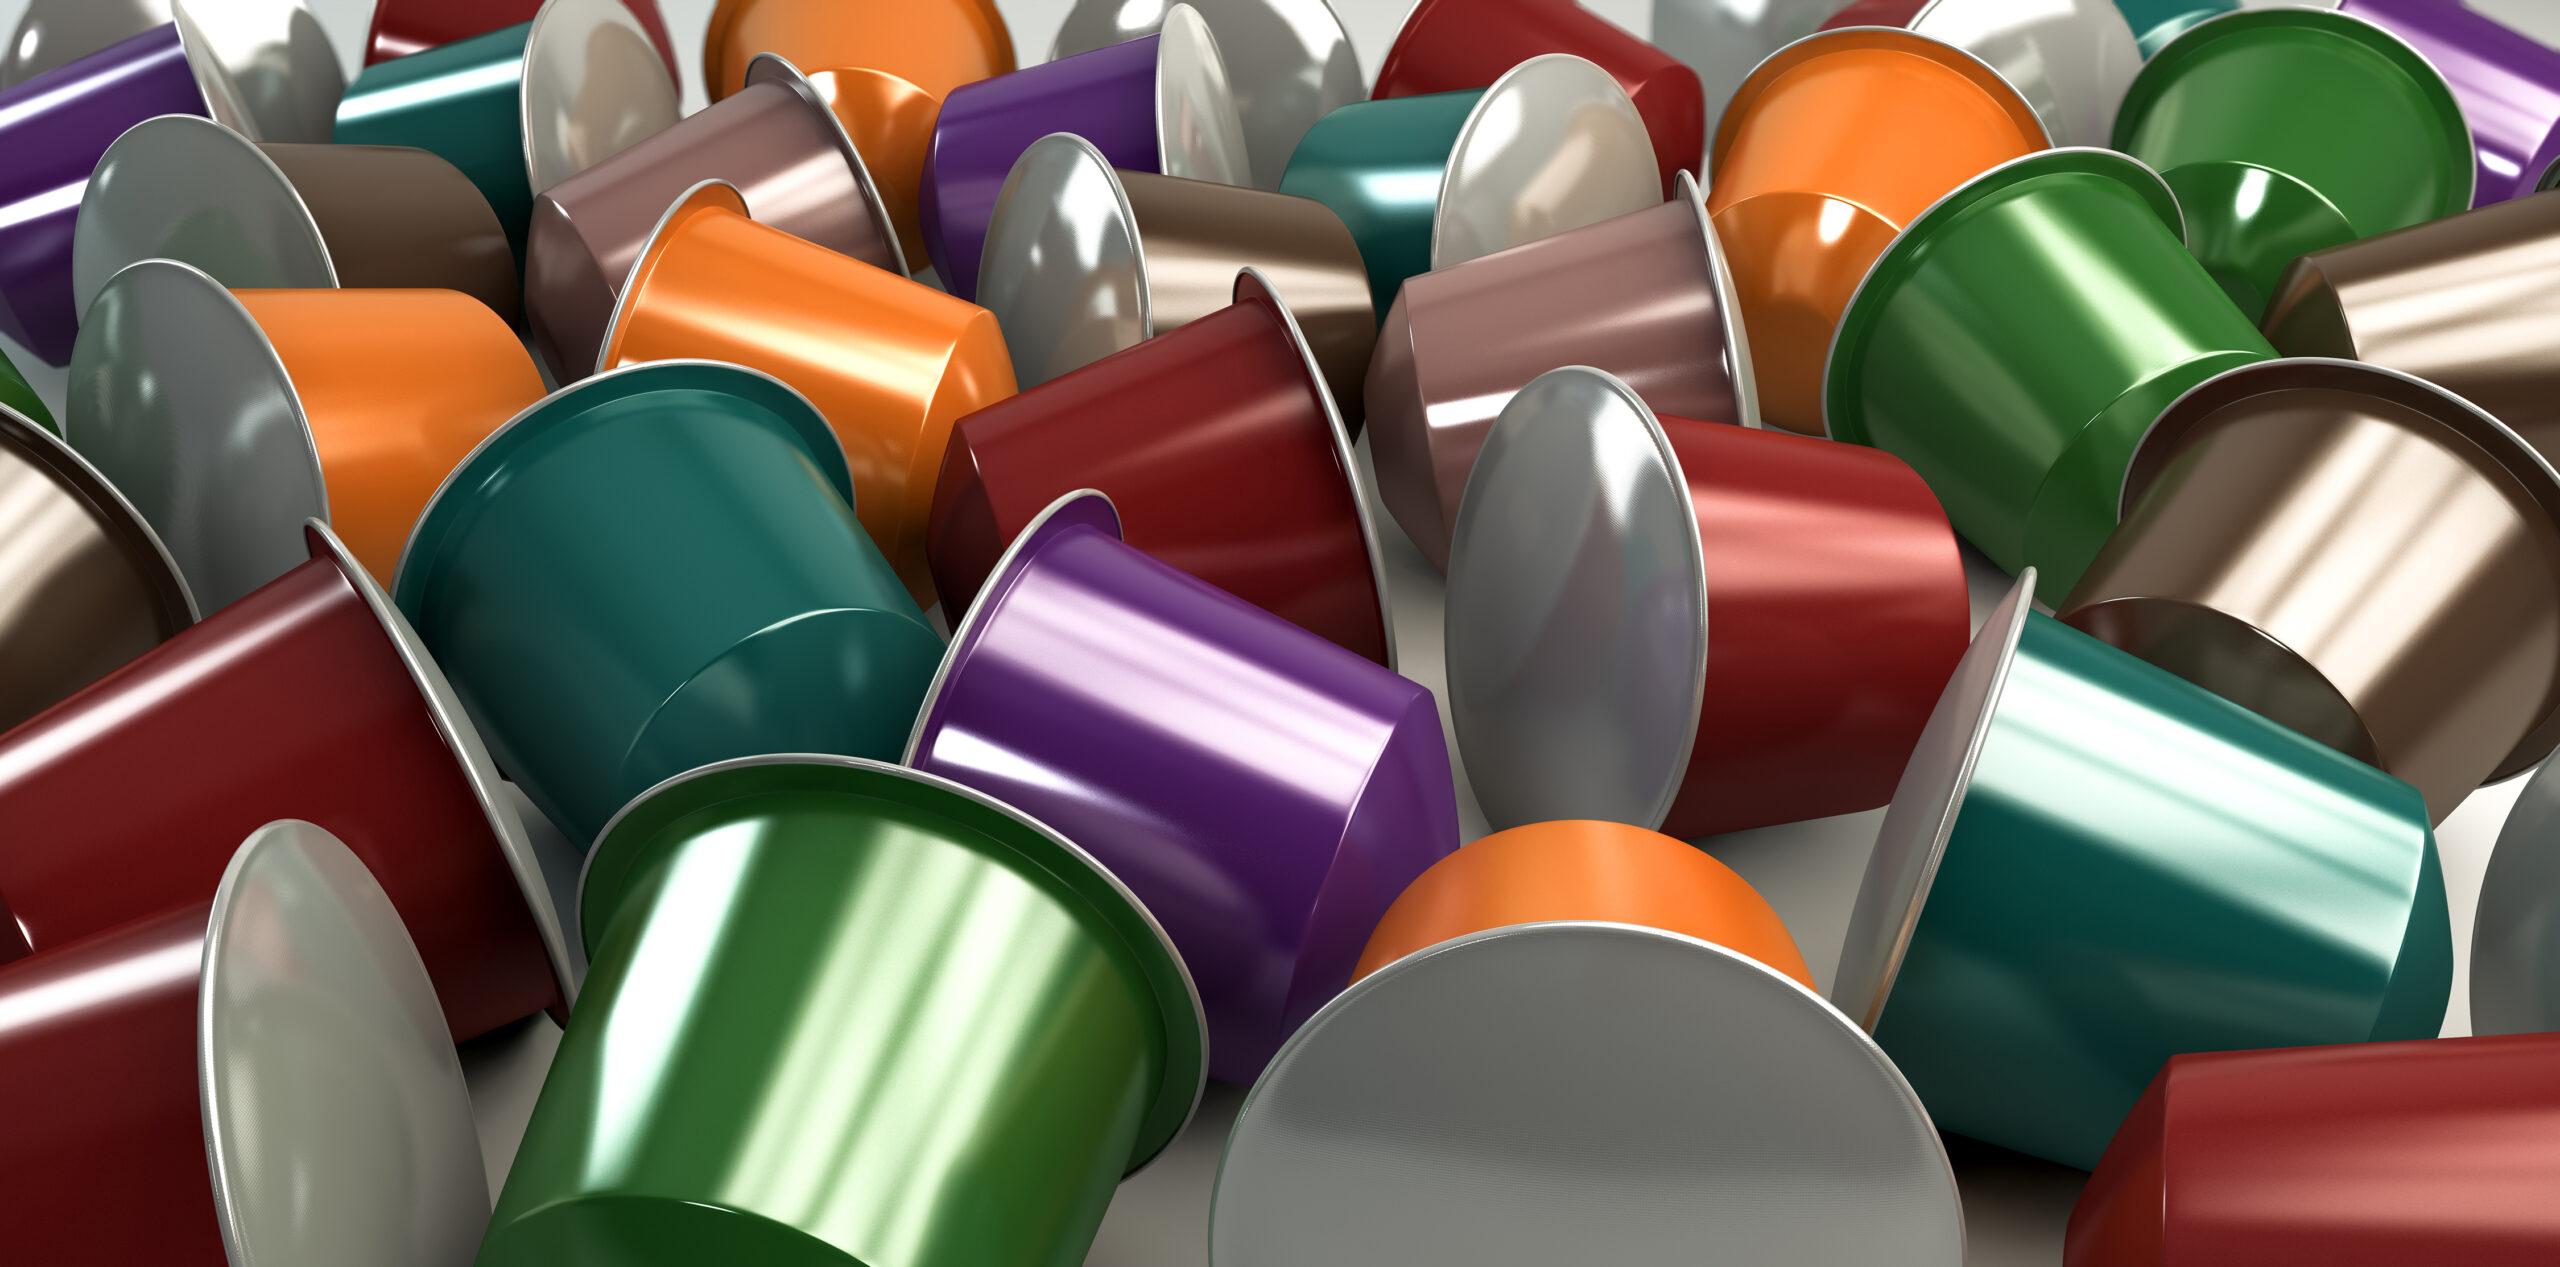 3D Layout Rychiger Verpackung und Hunkeler Absauganlage